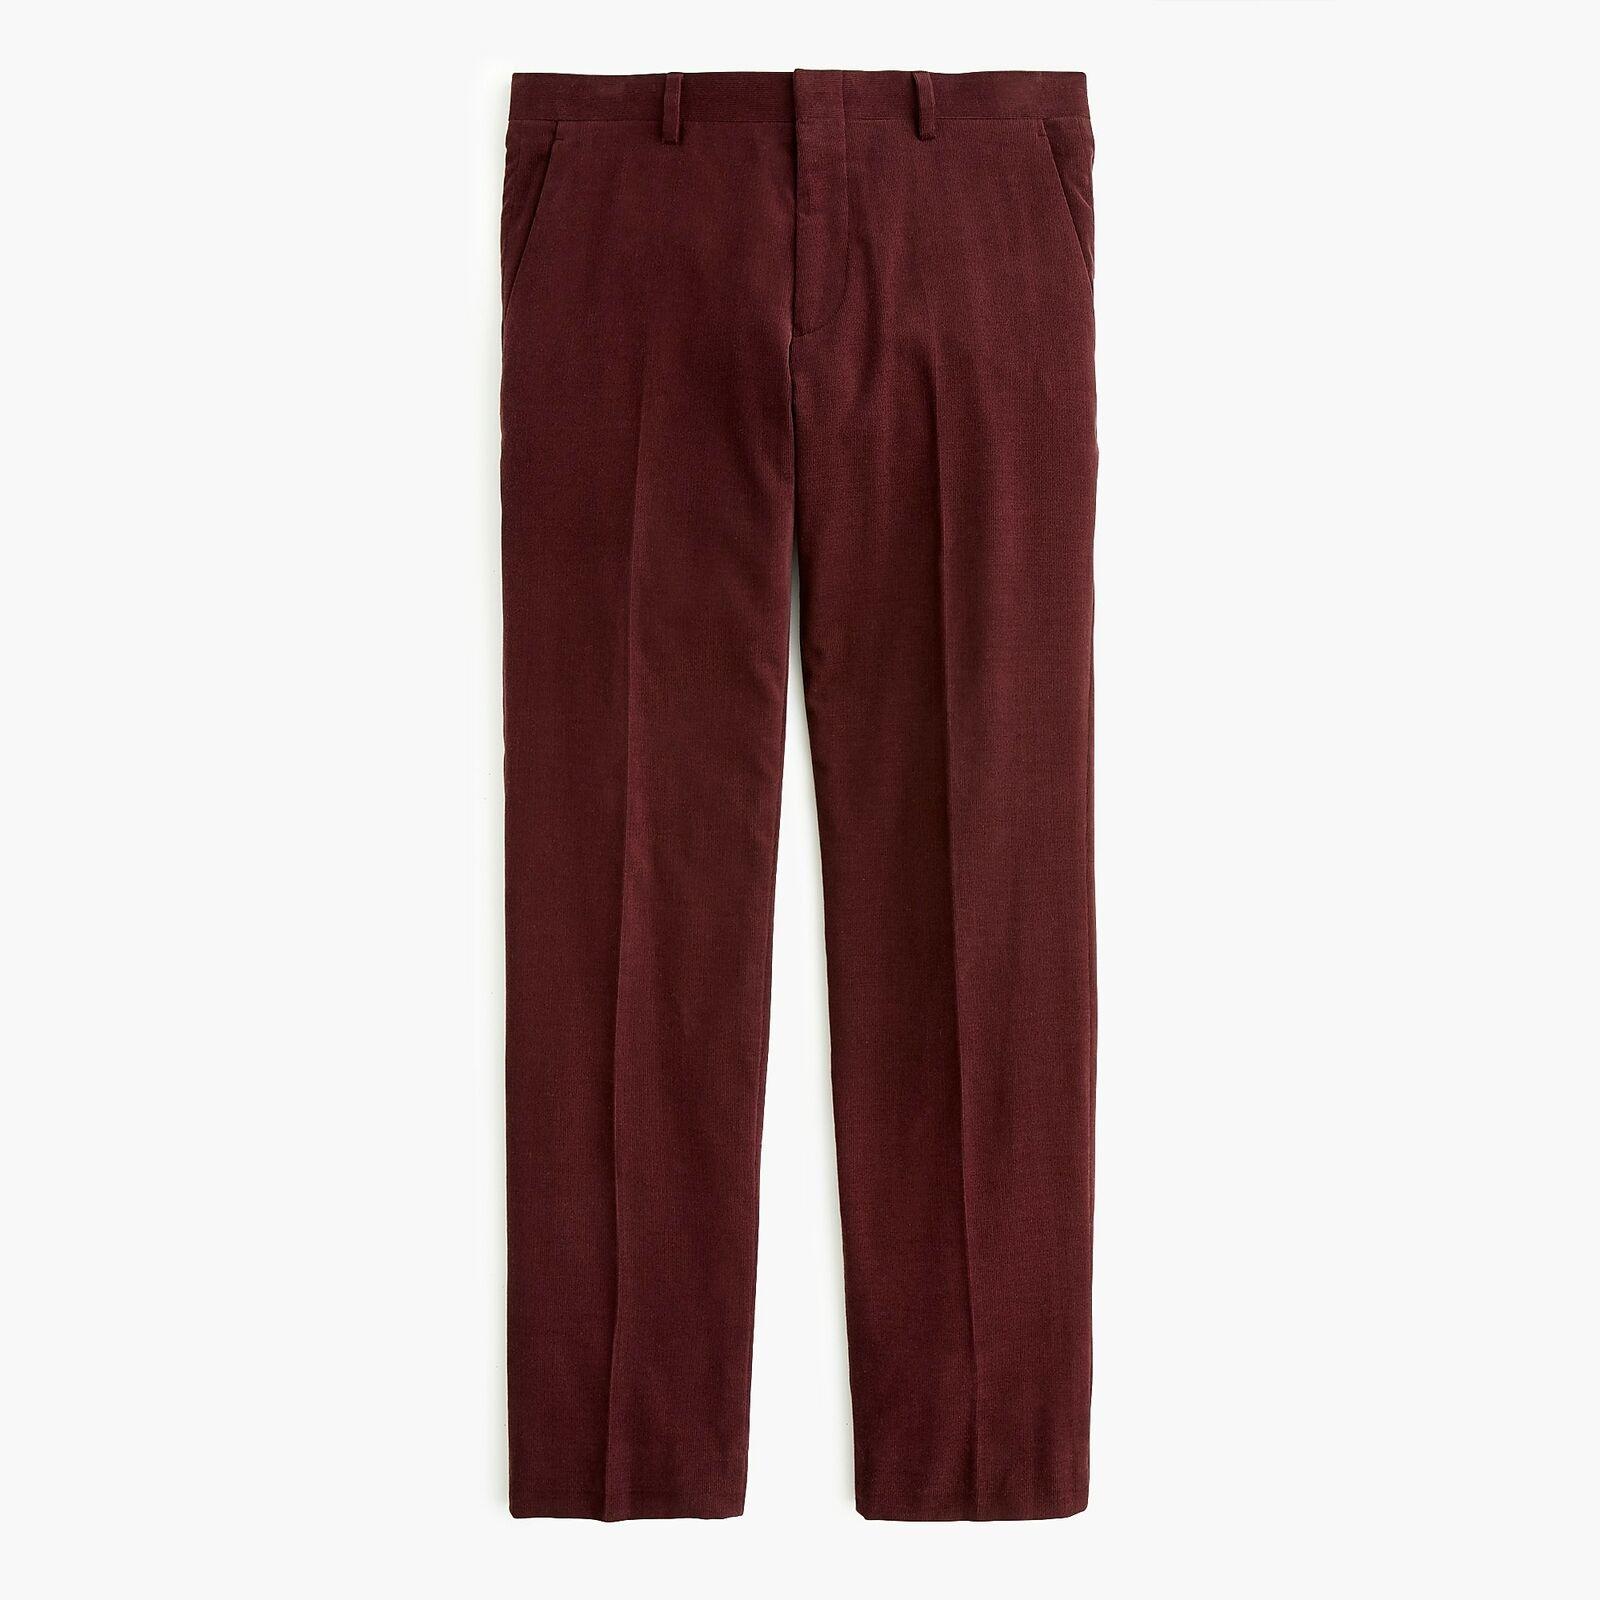 J.Crew Ludlow Suit Pant in Italian Cotton Corduroy   32 30   Burgundy